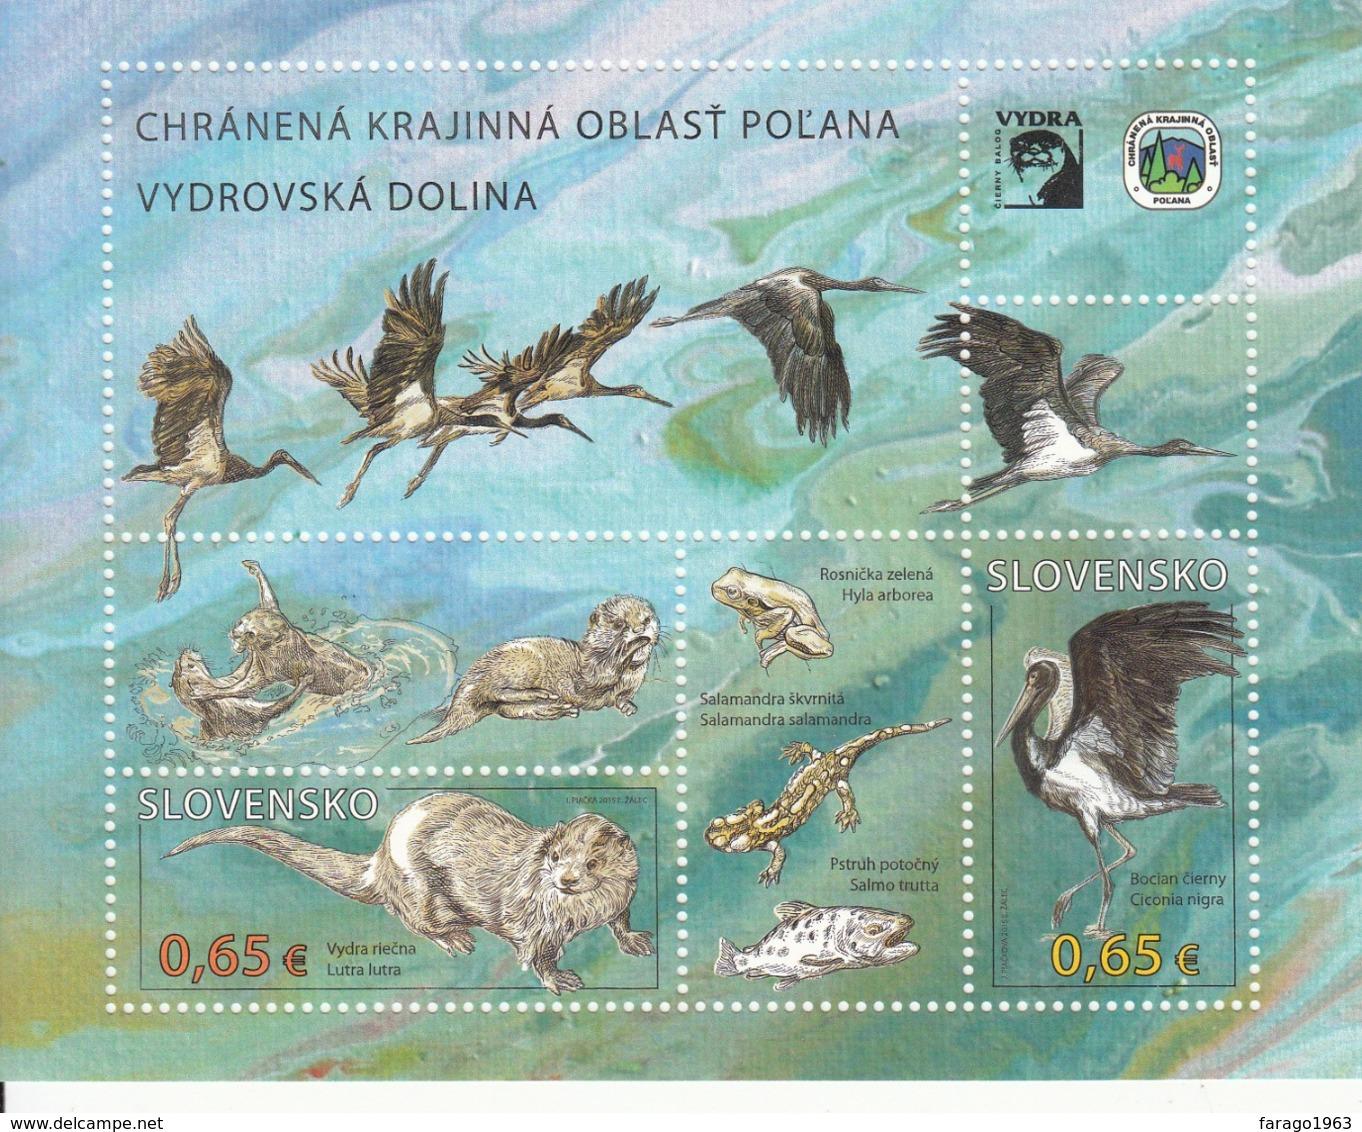 2015 Slovakia Nature Protection Birds Otters  Miniature Sheet   MNH  @ BELOW FACE VALUE - Blocks & Kleinbögen